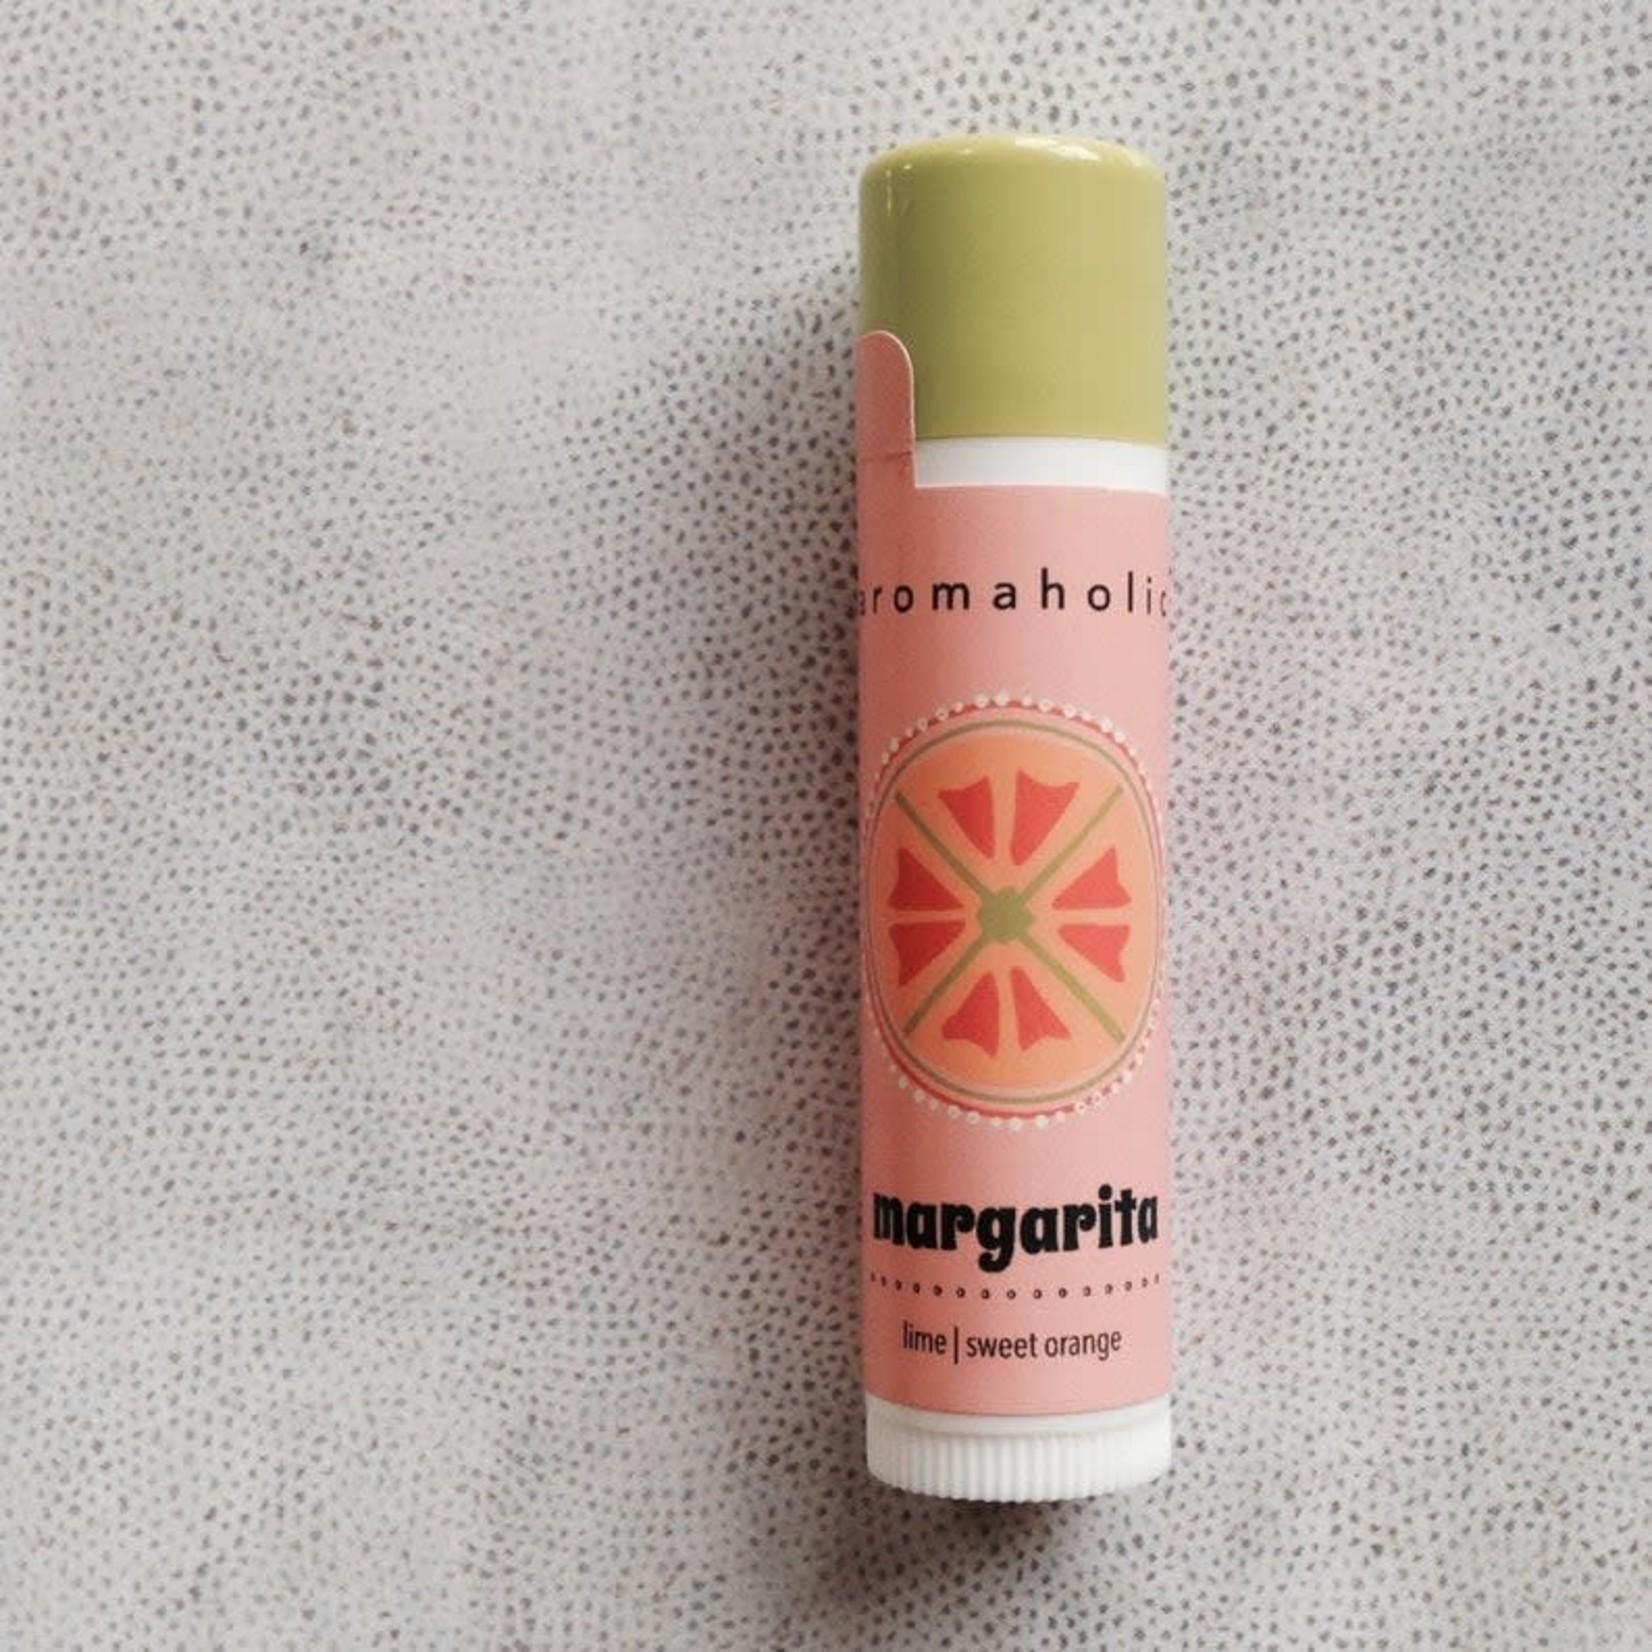 Aromaholic Margarita Cocktail Lip Balm